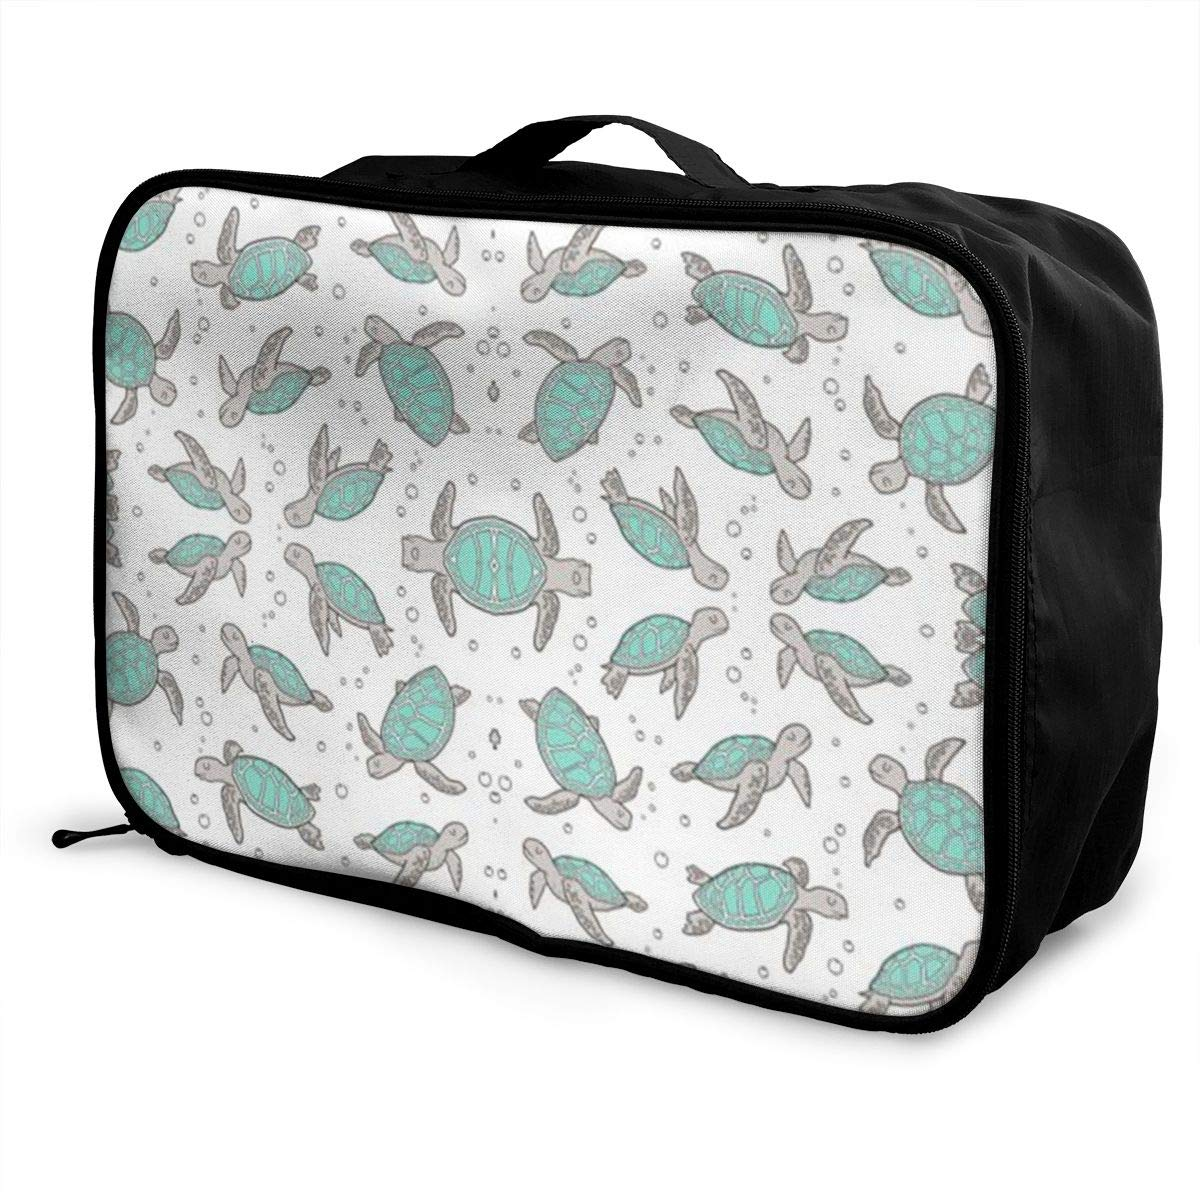 ADGAI Green Leaves Canvas Travel Weekender Bag,Fashion Custom Lightweight Large Capacity Portable Luggage Bag,Suitcase Trolley Bag